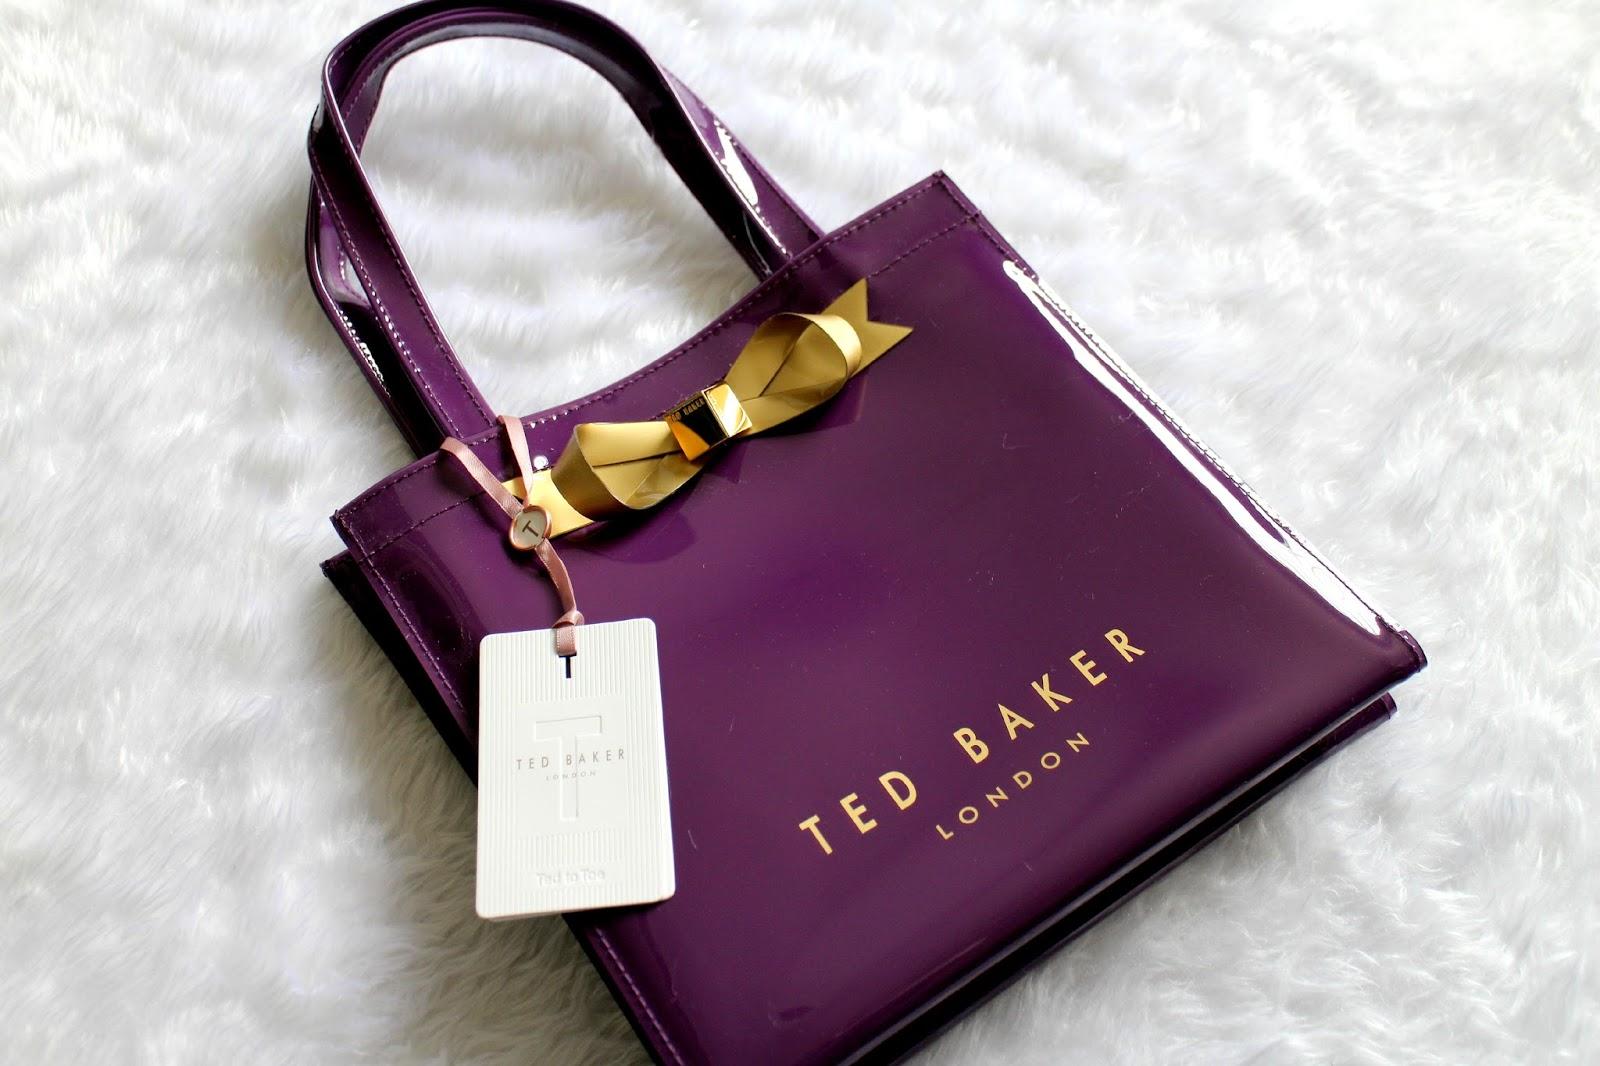 Ted Baker Mini Bowcon Bag